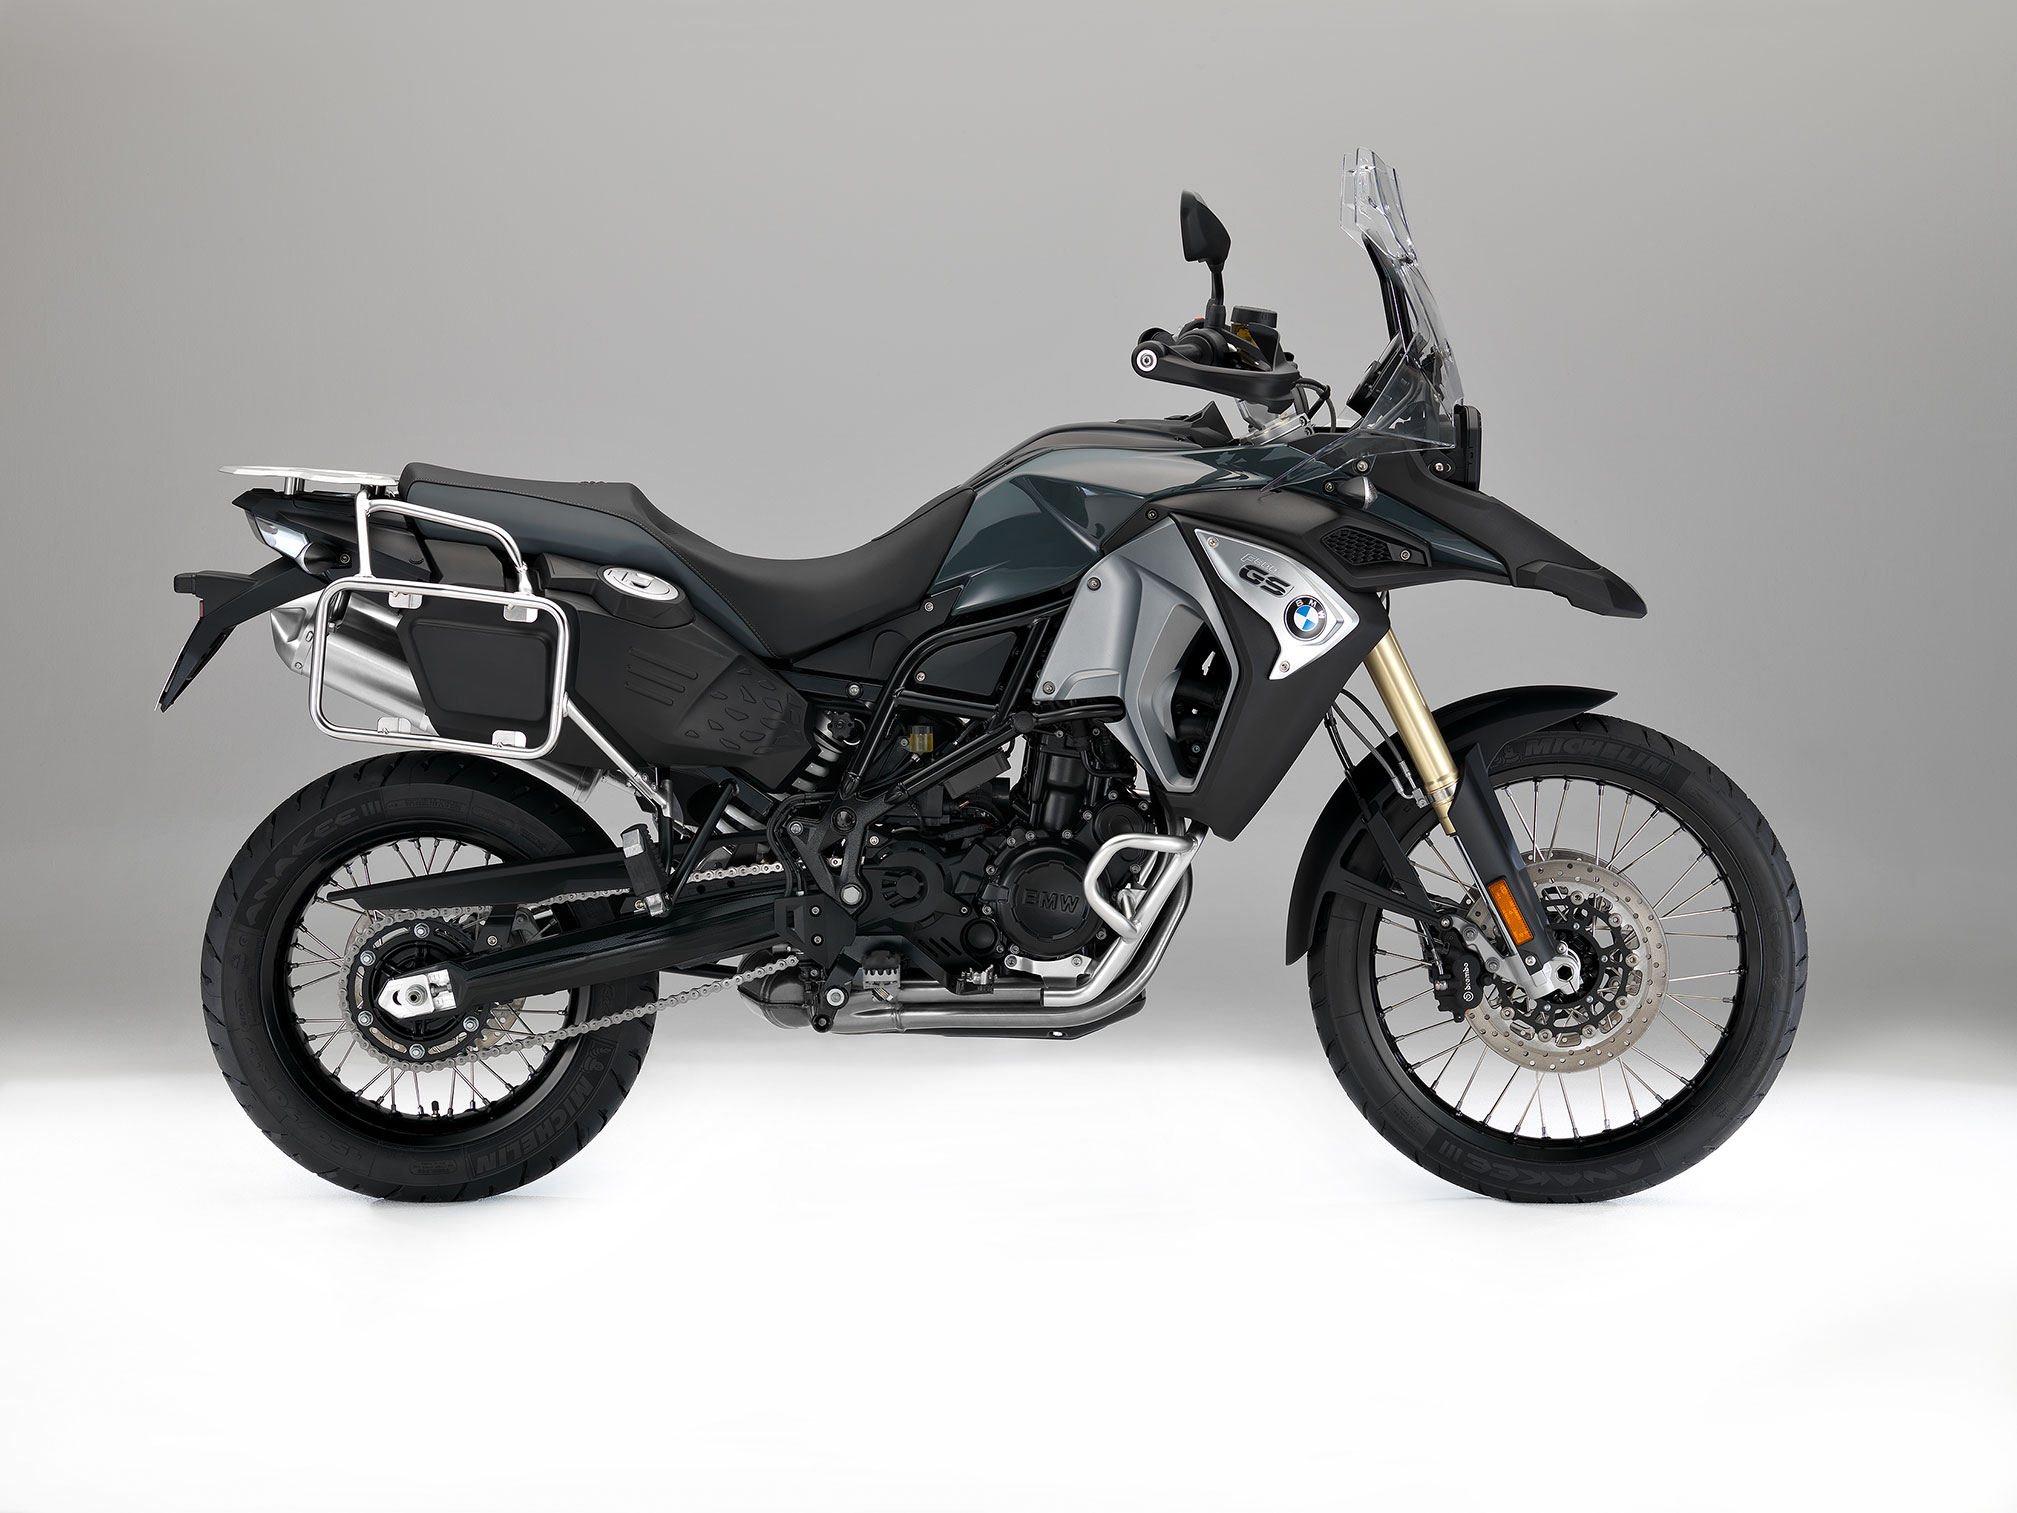 BMW MOTORCYCLE PARTS FROM PREDATOR MOTORSPORT